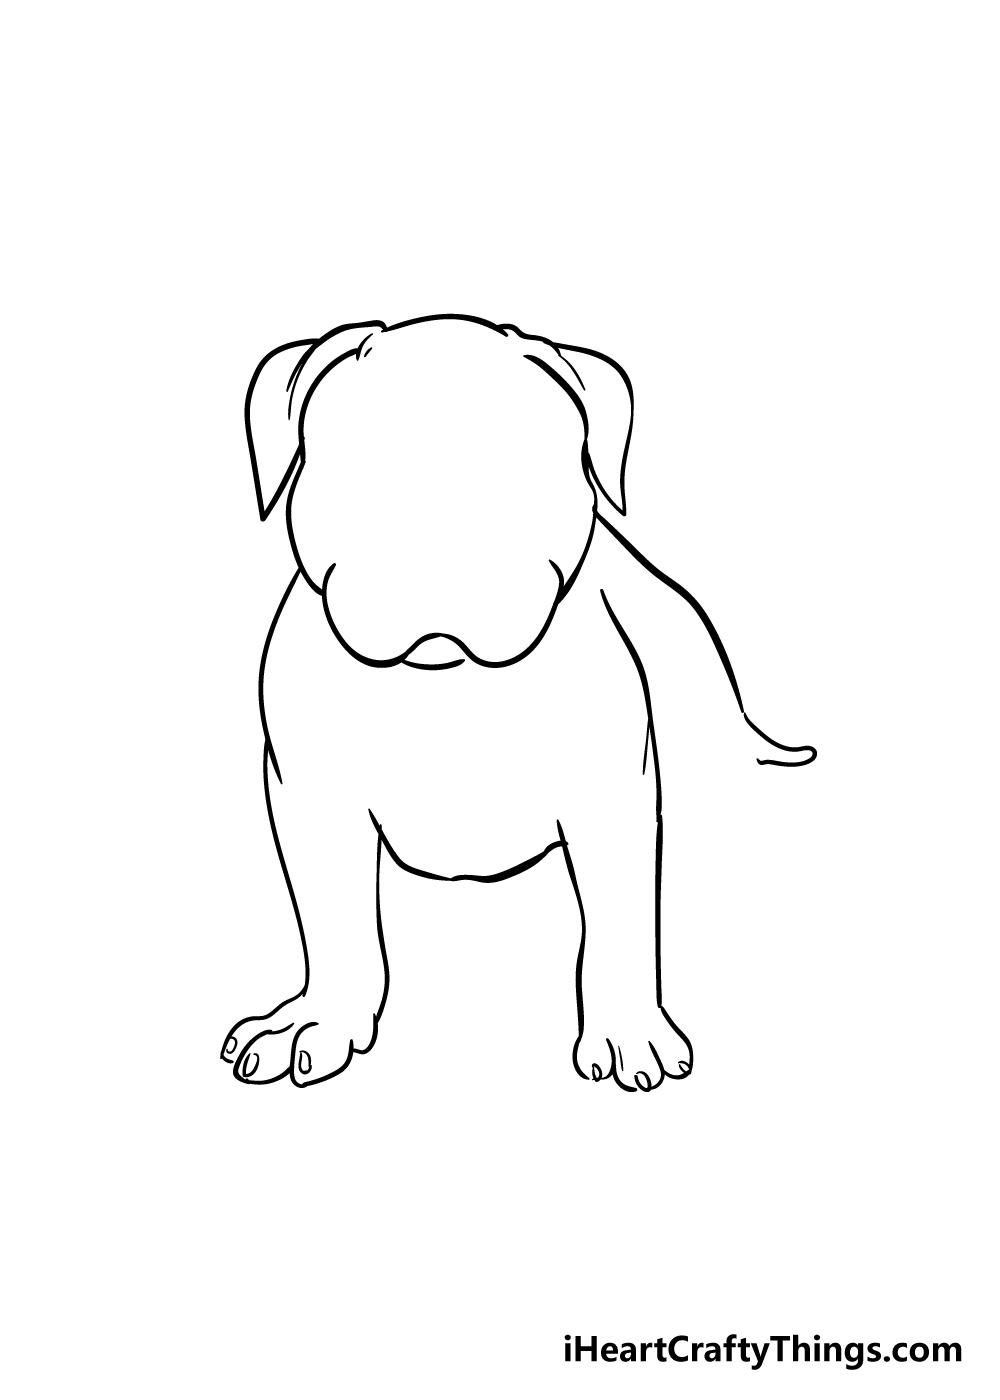 pitbull drawing step 4